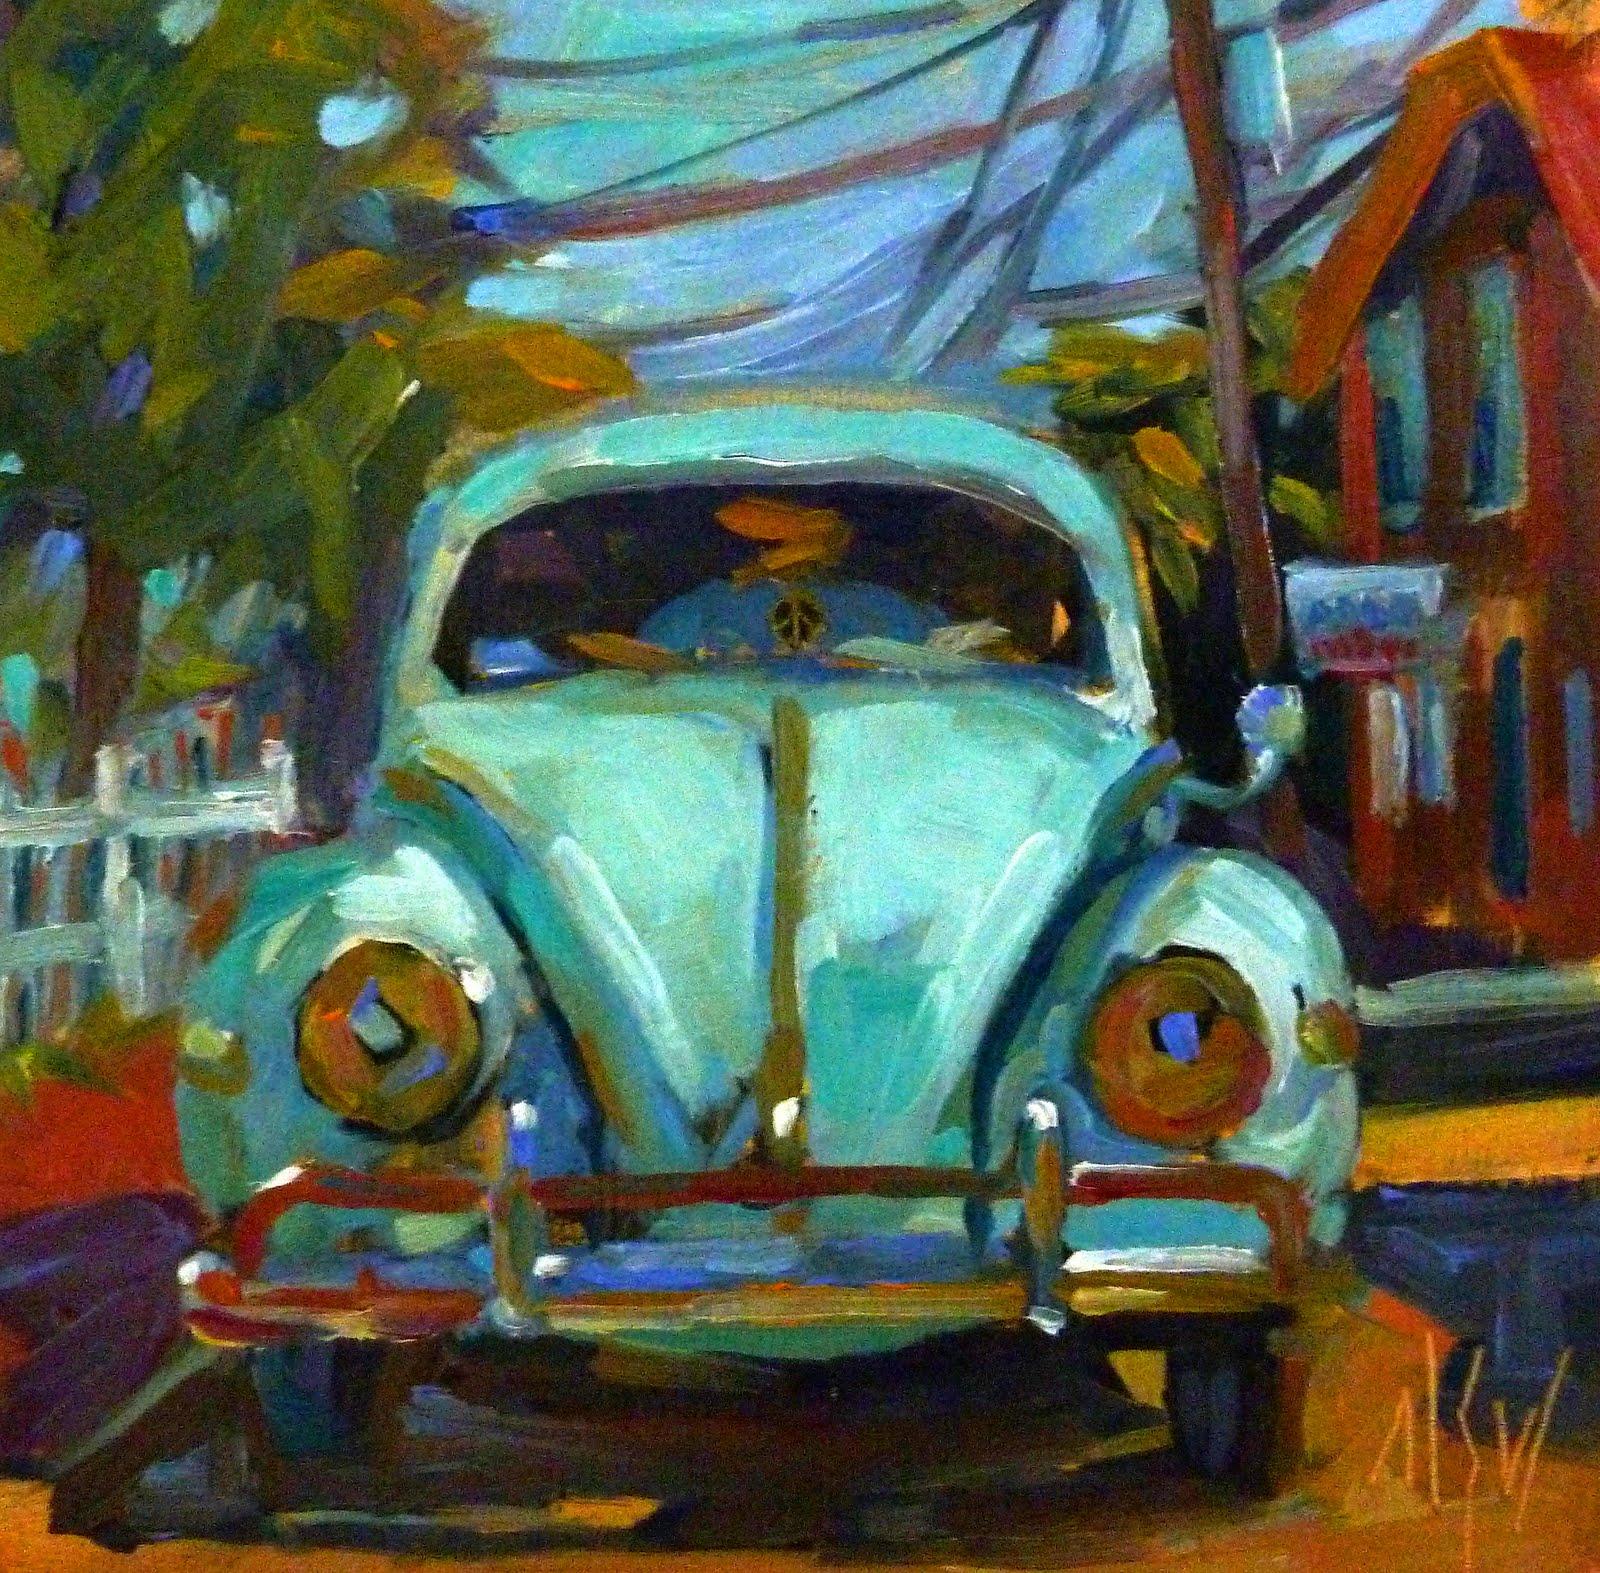 """That's Classic 6x6 oil on gessoboard Classic Volkwagen SOLD"" original fine art by Mary Sheehan Winn"